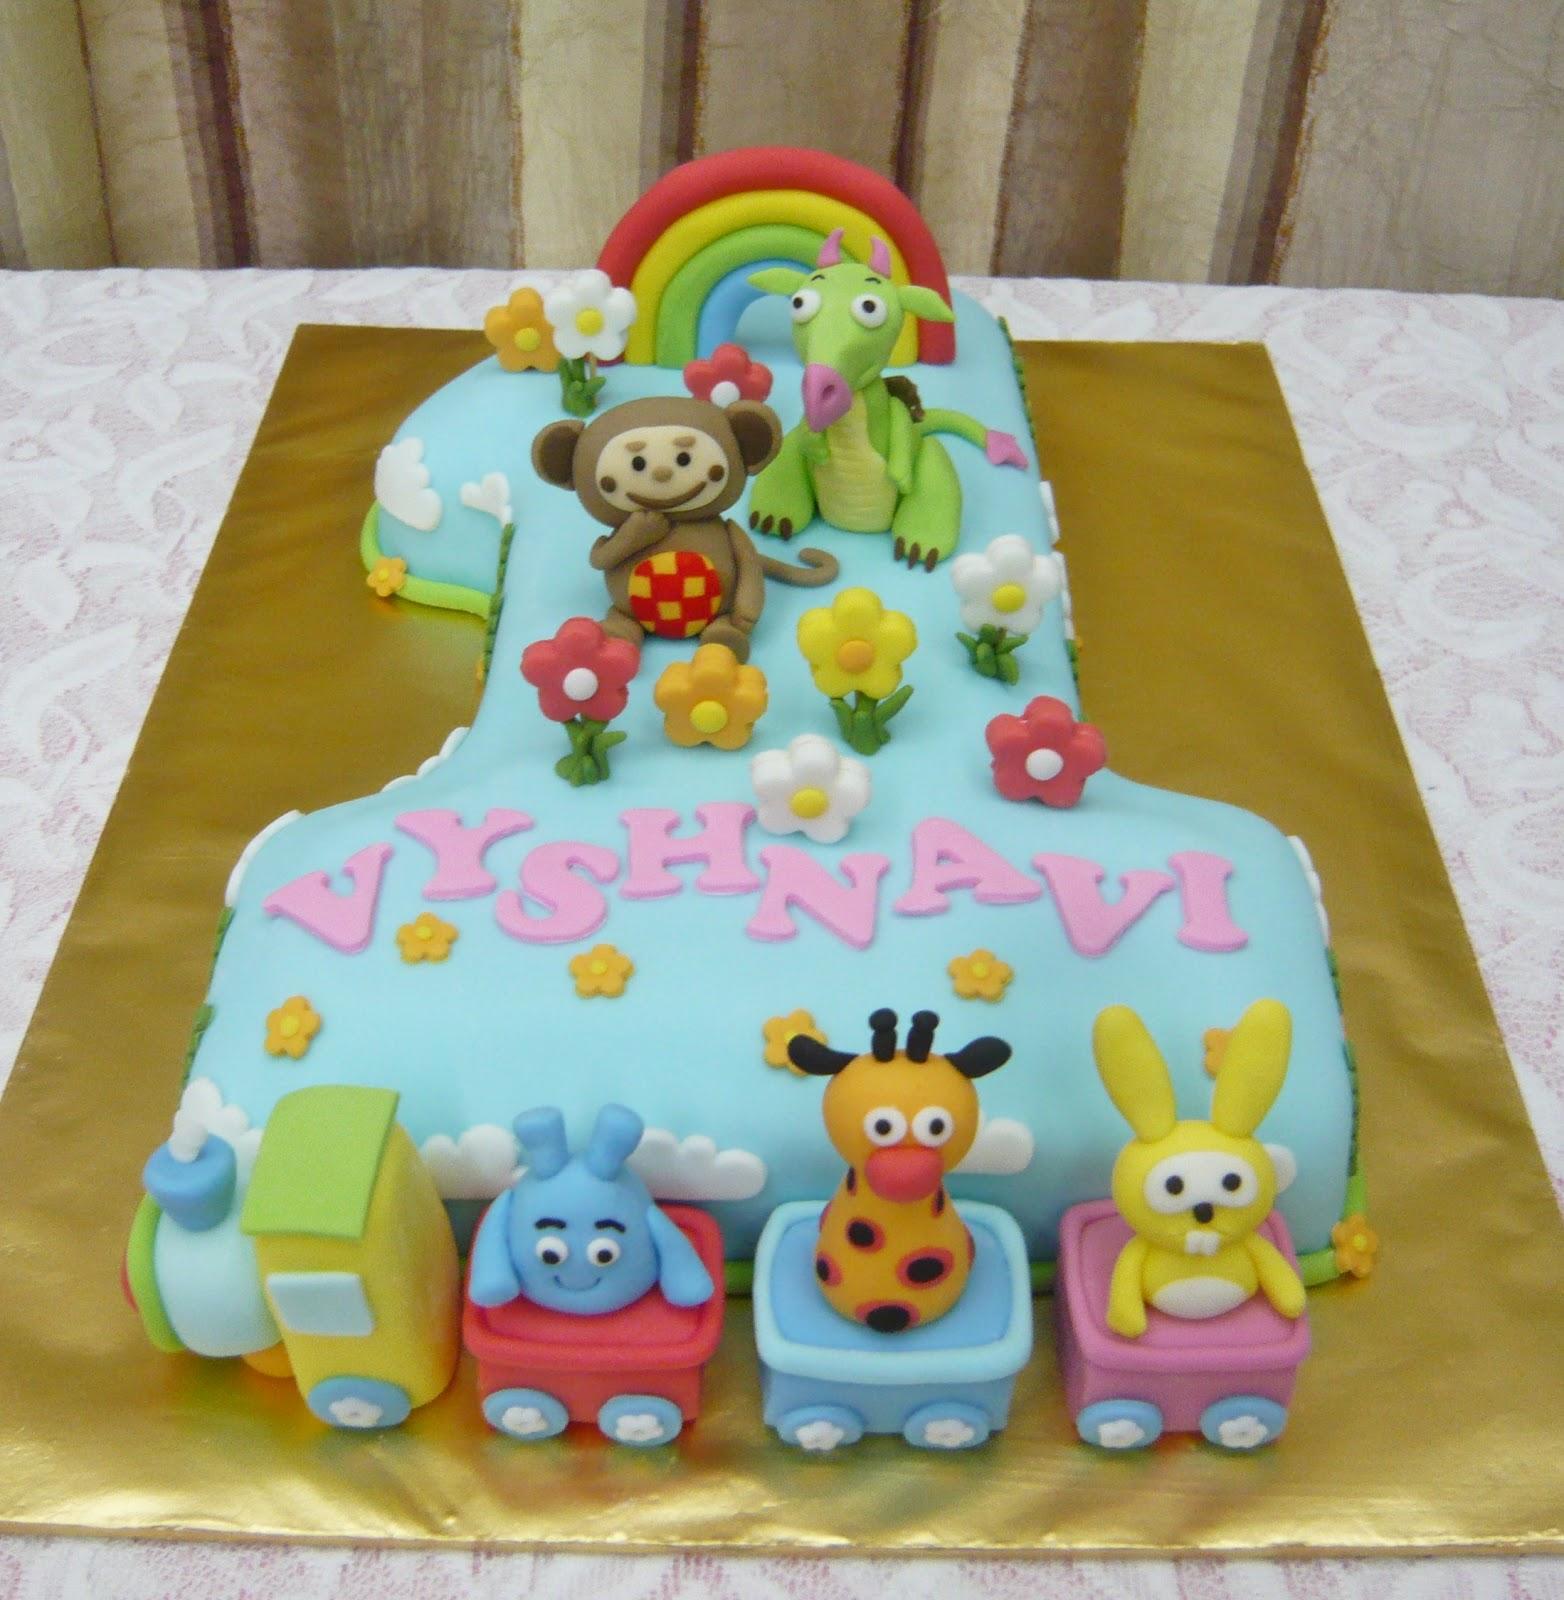 Baby Tv Cake Images : Jenn Cupcakes & Muffins: No.1 Baby TV Cake